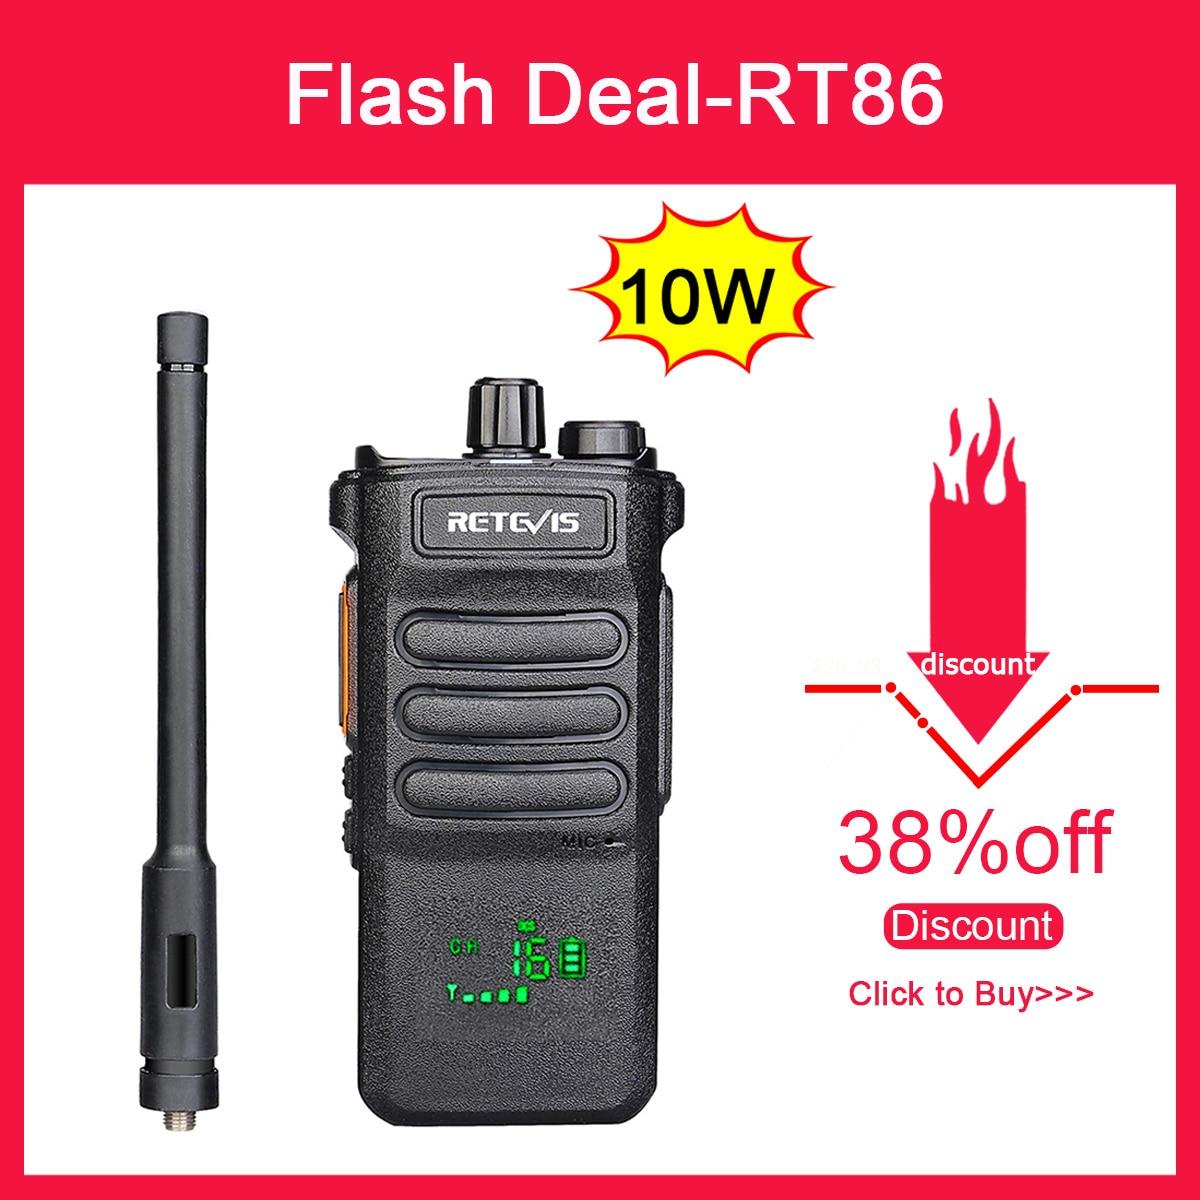 10W Retevis Walkie Talkie Long Range RT86 Walkie-talkies 1 2 pcs Portable Radio For Hunting Powerful walkie-talkie Two-way radio